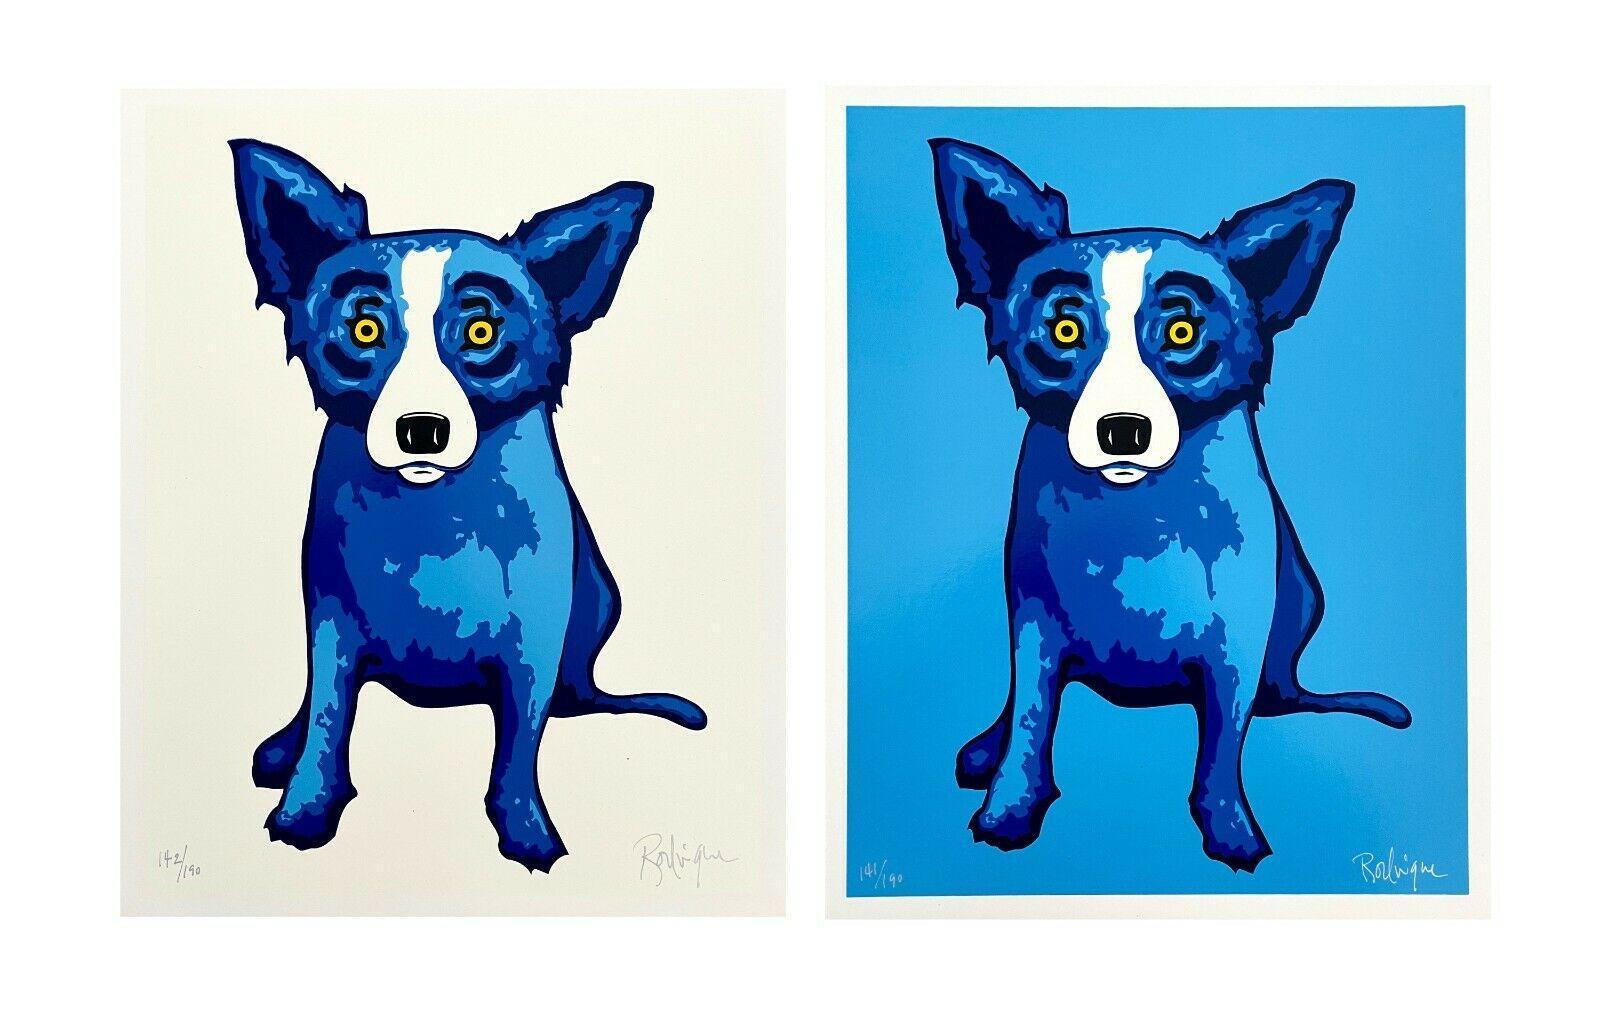 Blue Dog Diptych (2 artworks), Ltd Ed Silkscreens, George Rodrigue SIGNED